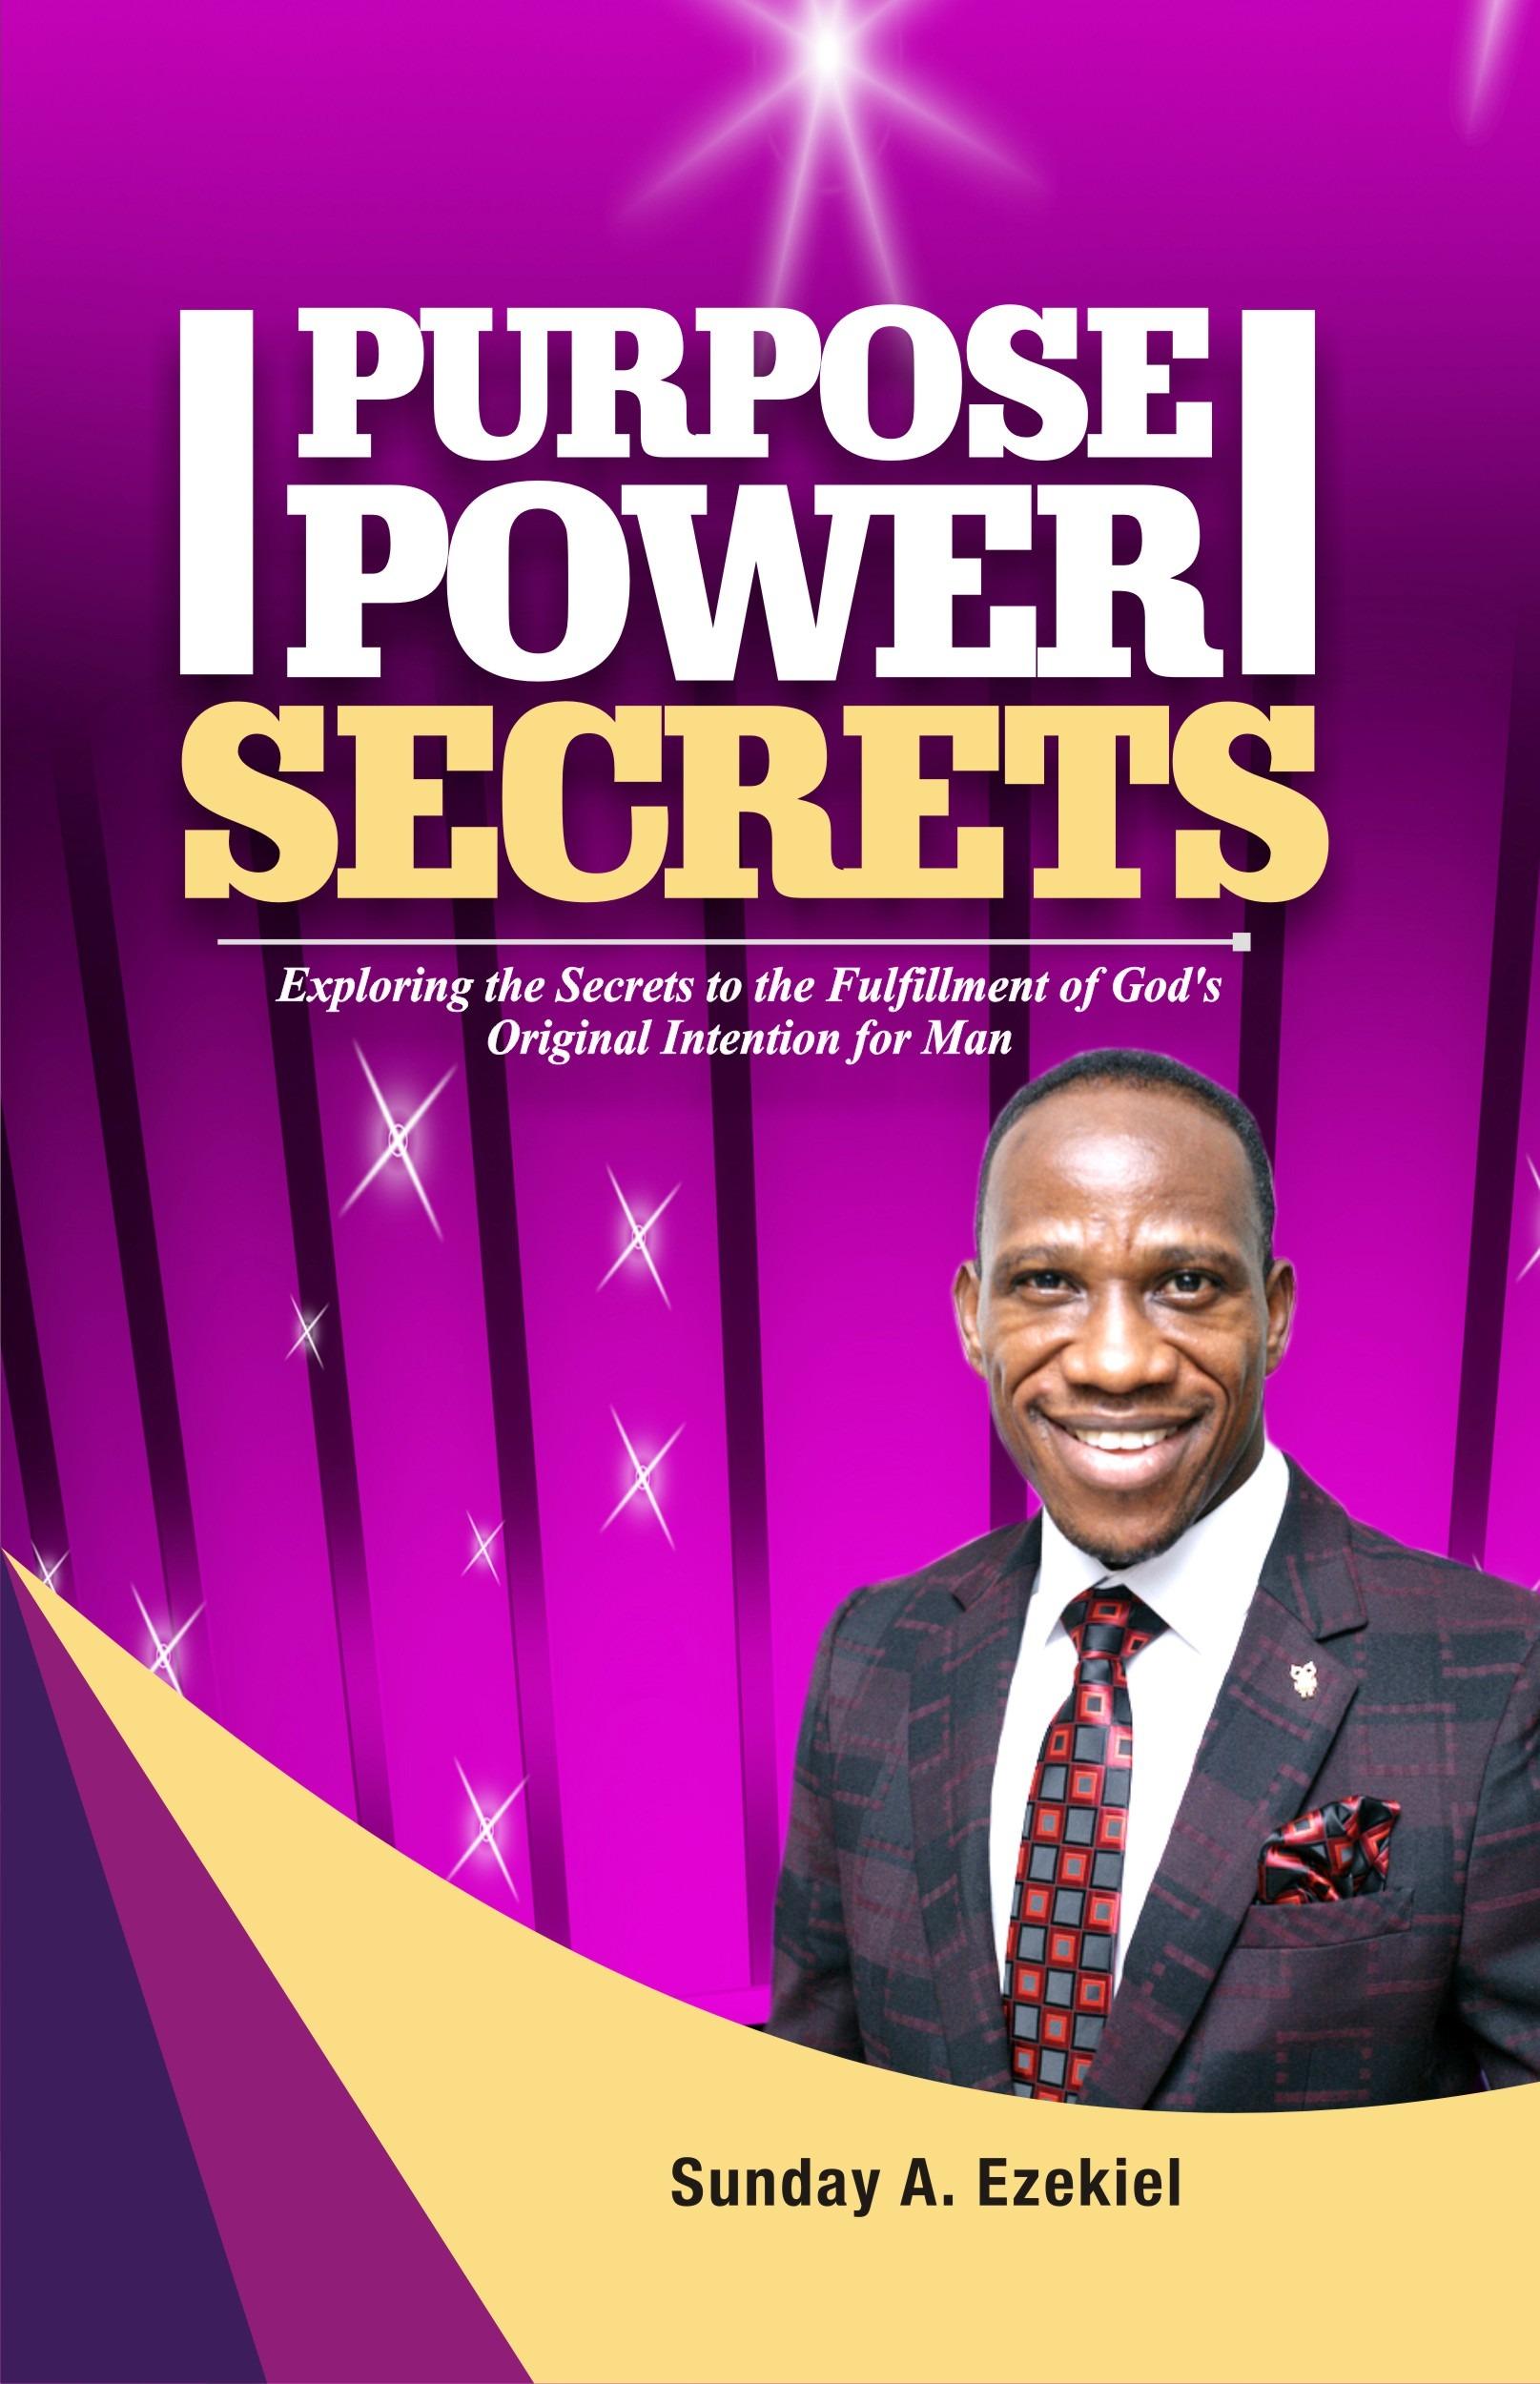 Purpose Power Secrets